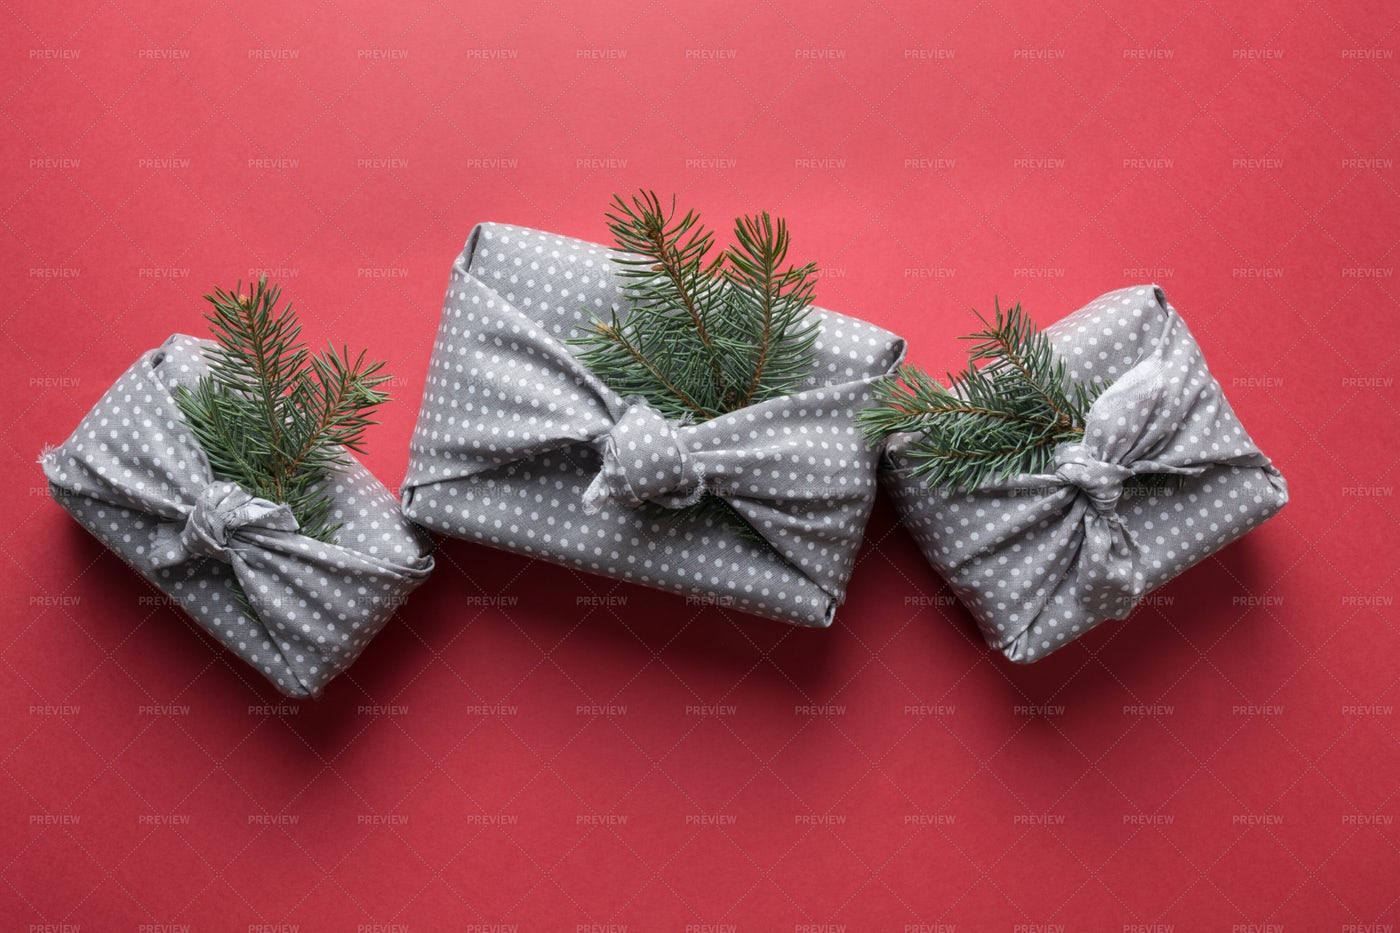 Three Christmas Gifts: Stock Photos